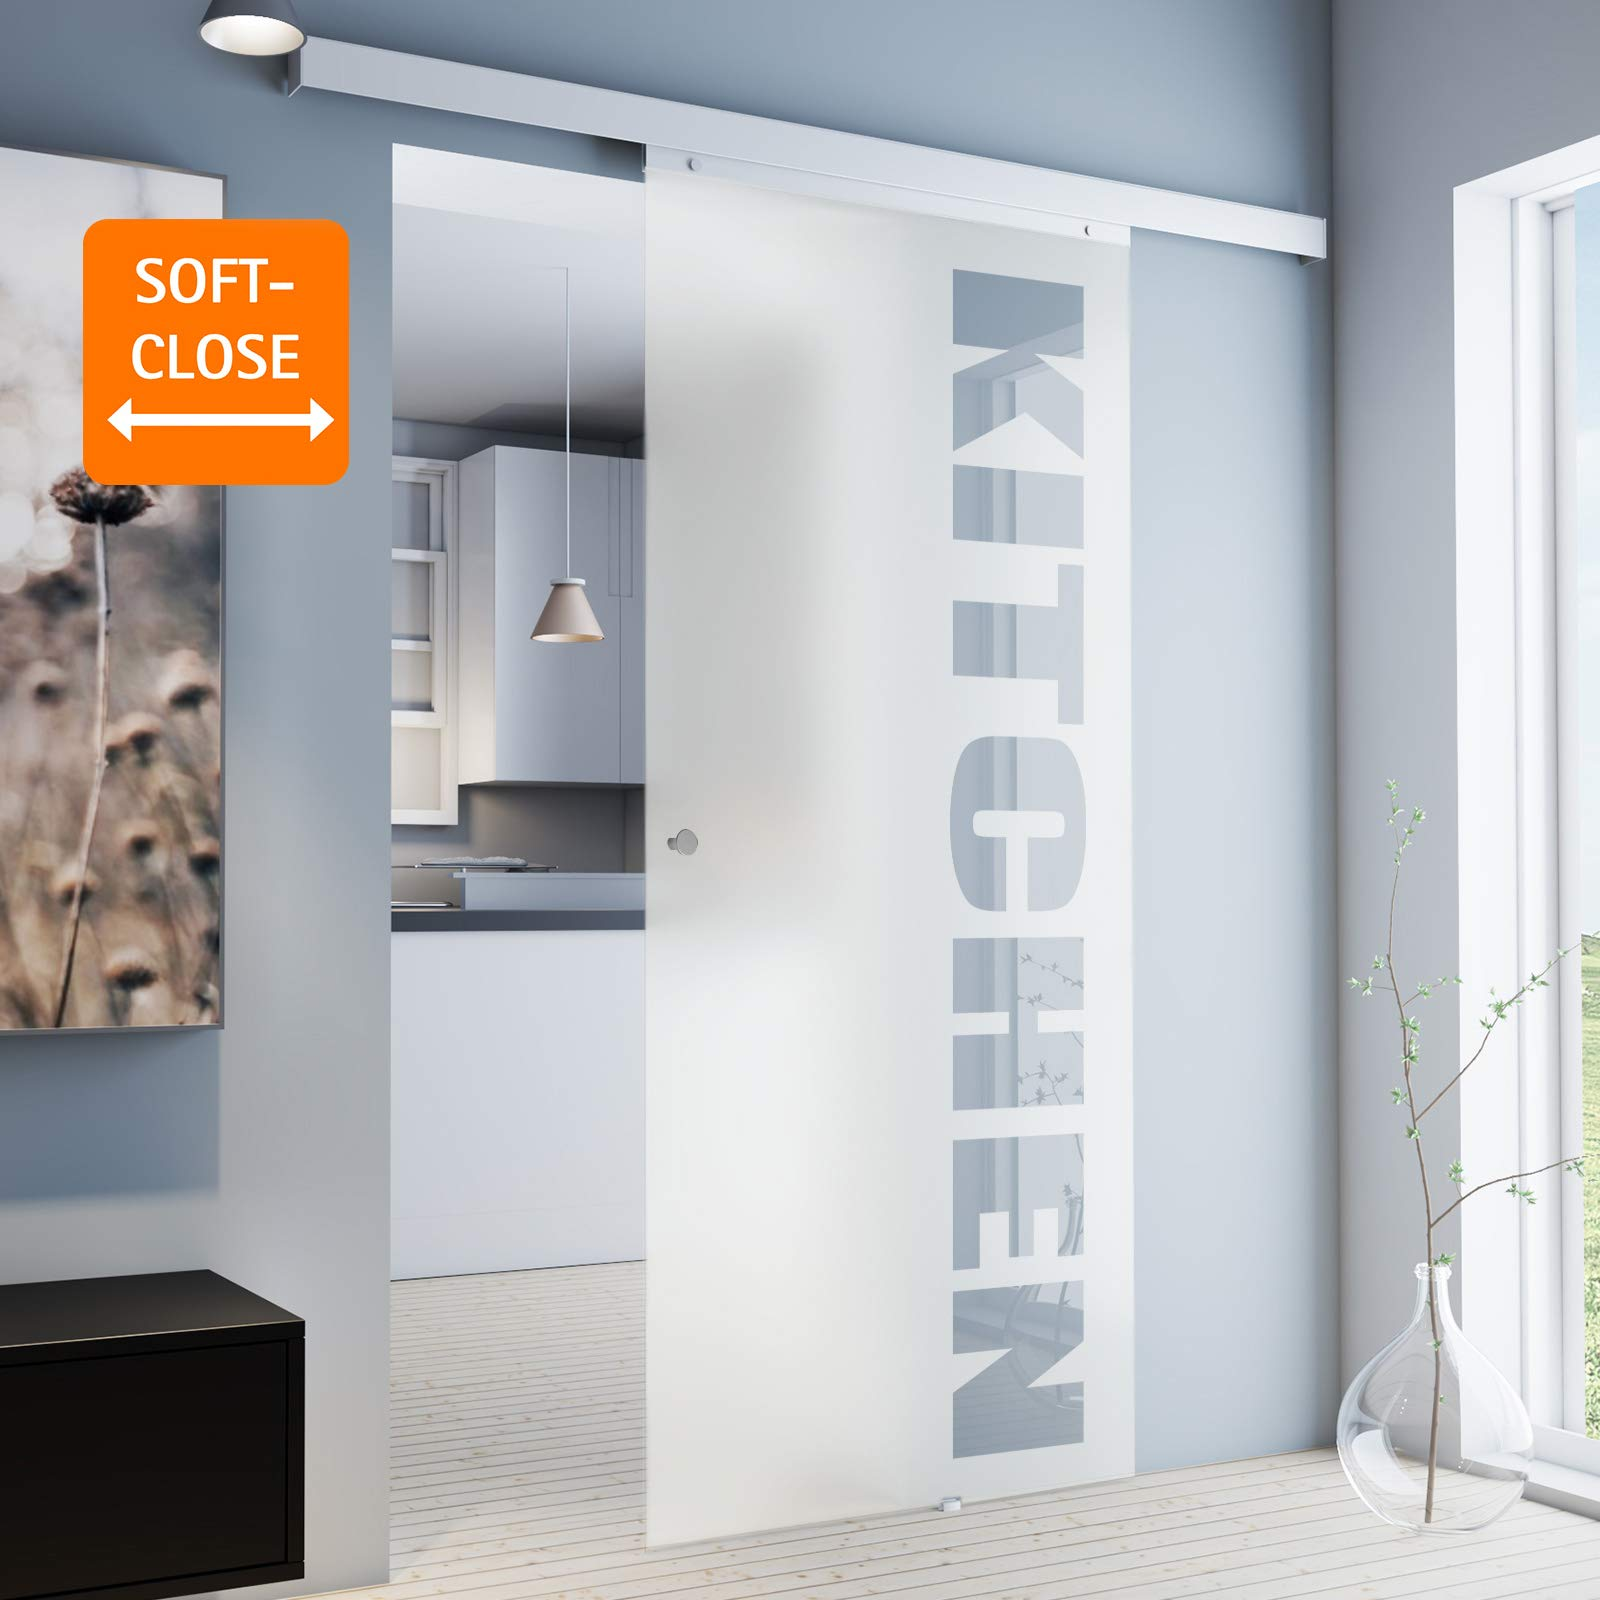 inova Cristal corredero 755 X 2035 X 8 mm con Texto Juego Completo de Puerta corredera de Herraje de Aluminio Opcional softclose, Griffknopf+Softclose: Amazon.es: Hogar